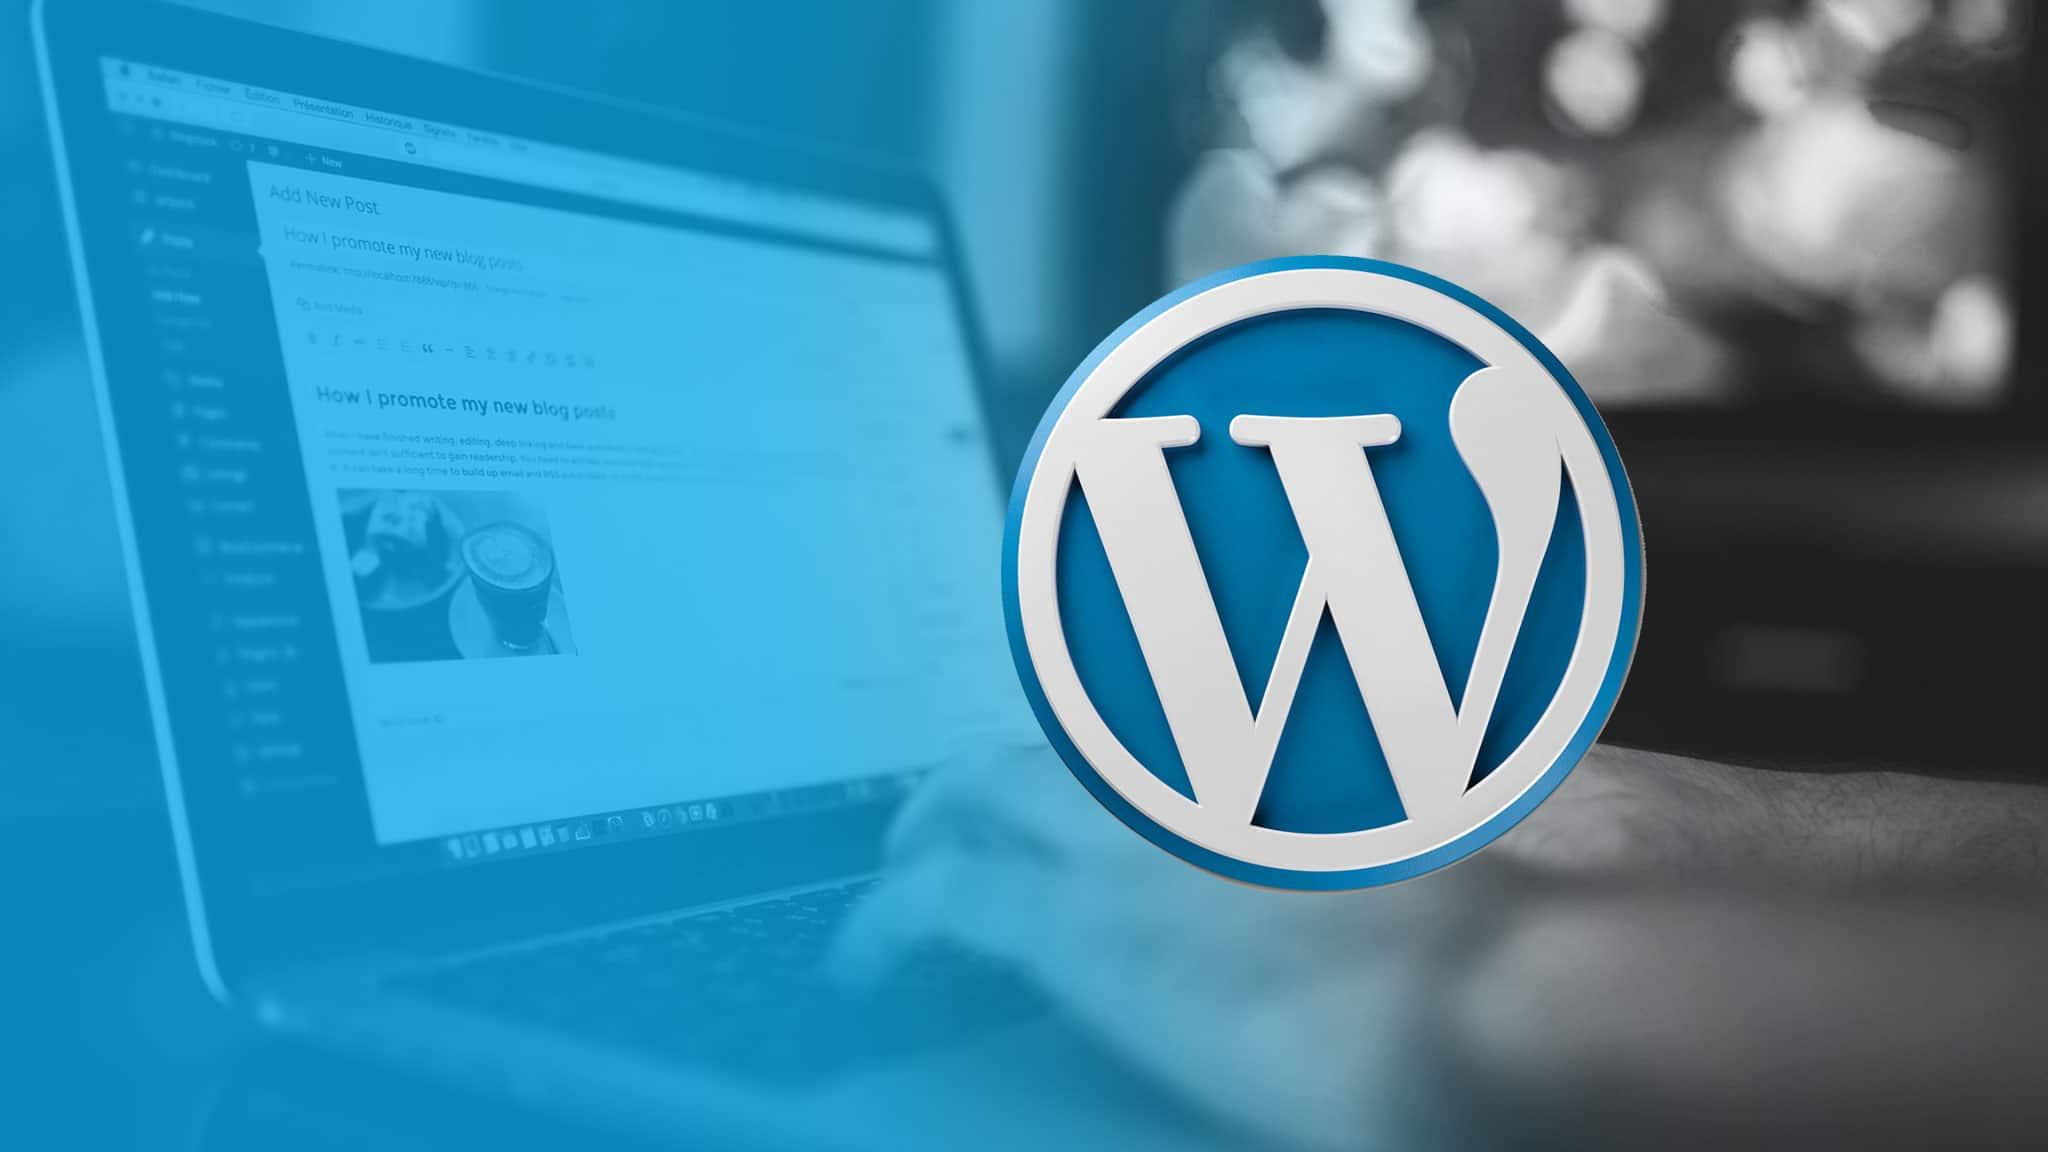 Wordpress Web Development Company Lebanon - WordPress Wallplayer - 2048x1152 - Download HD Wallpaper - WallpaperTip